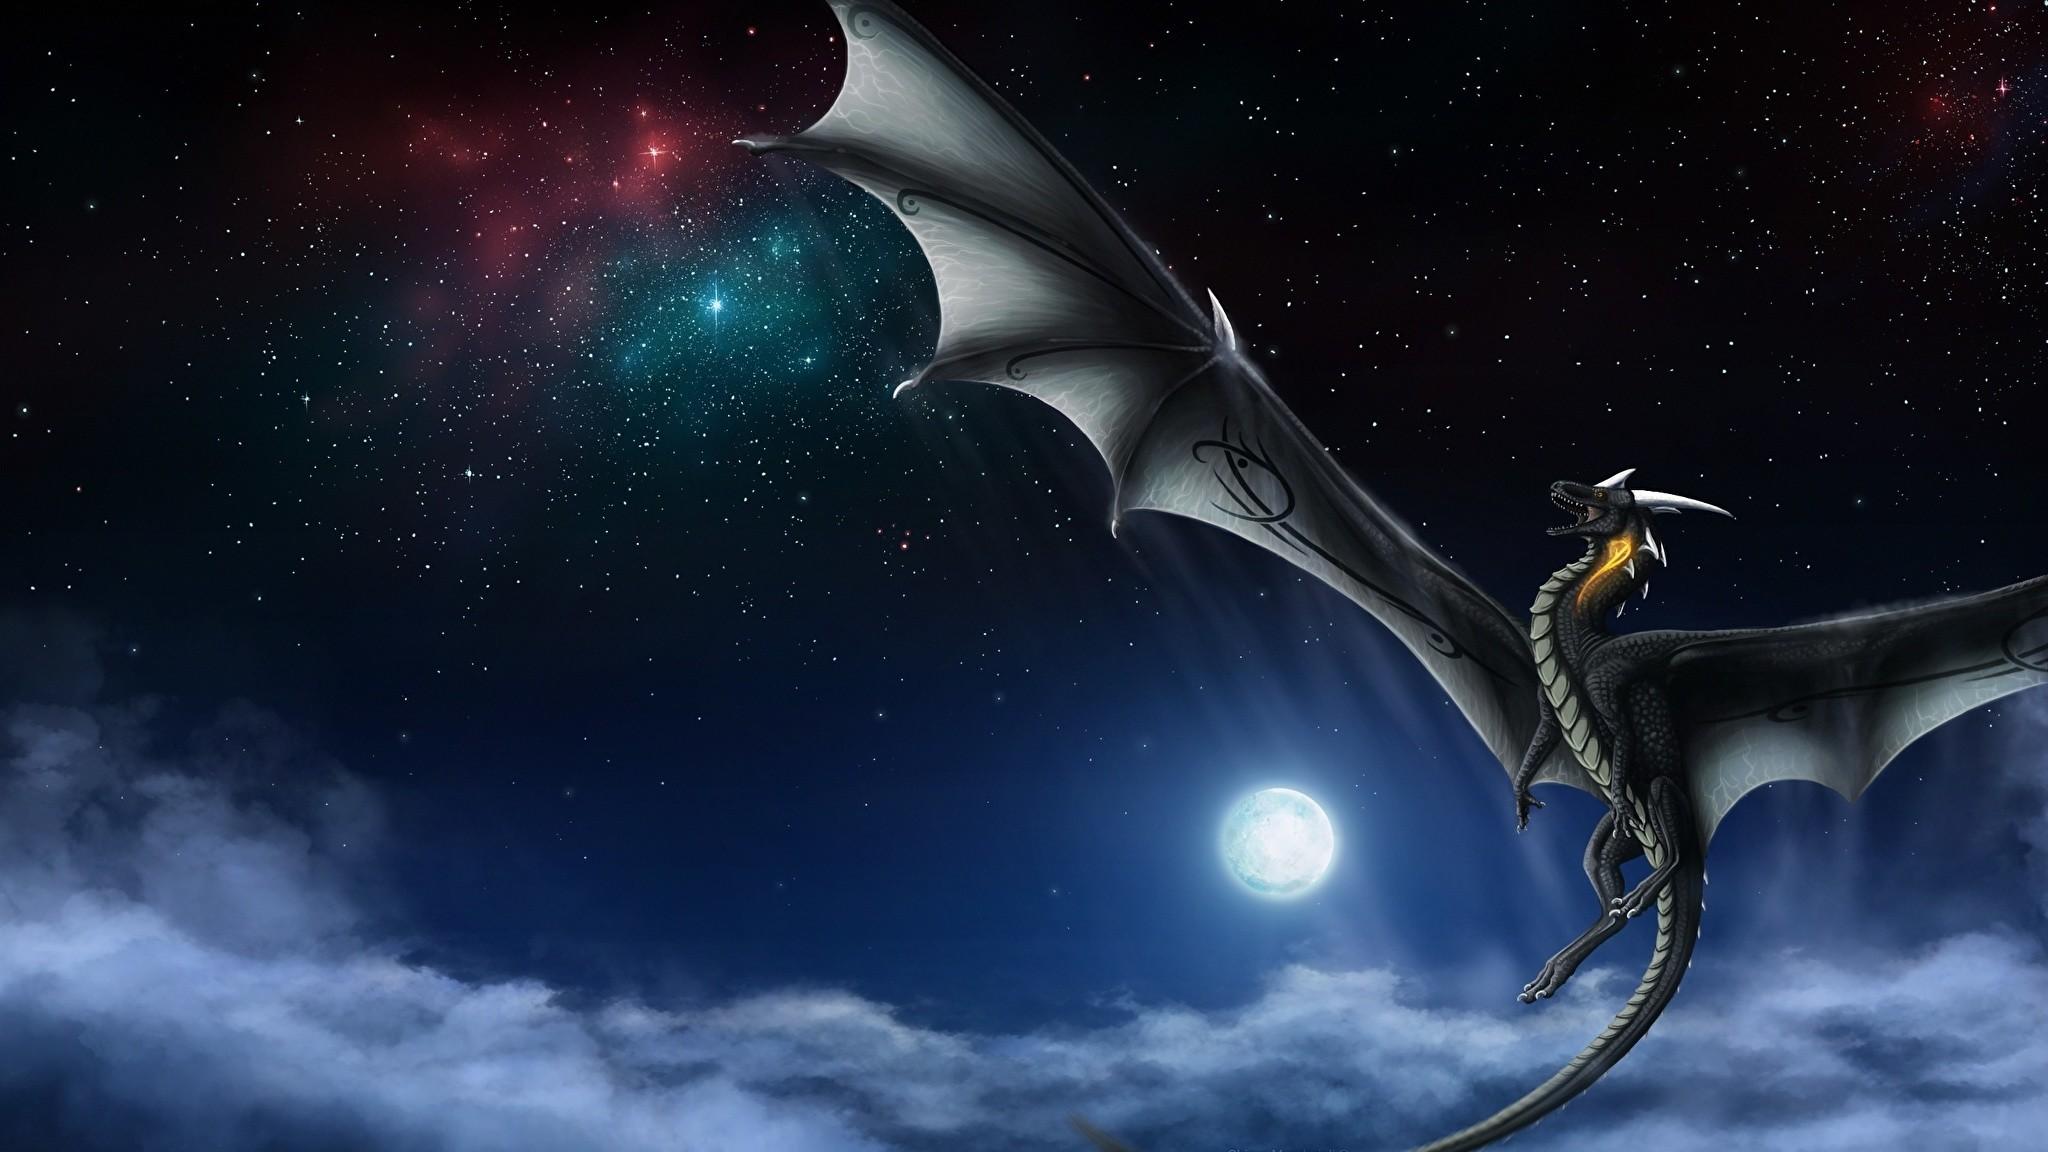 Wallpaper Dragons Fantasy Sky Moon 2048×1152